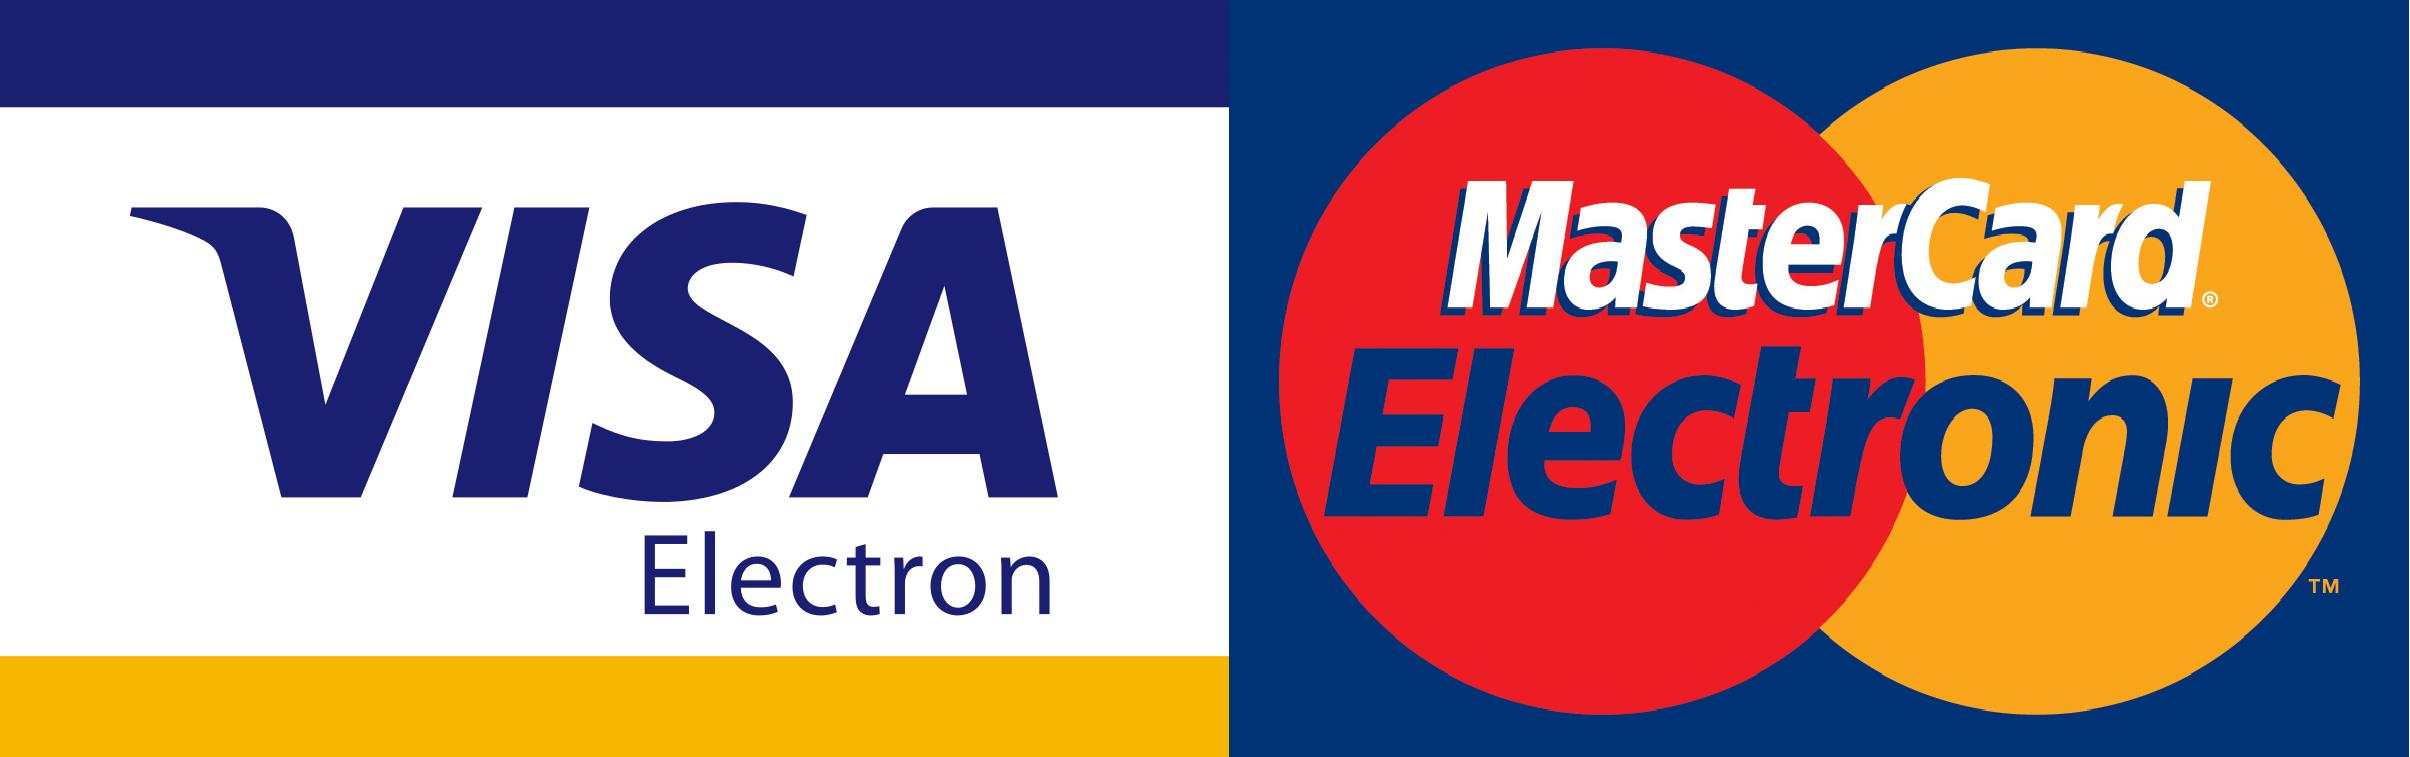 Карты формата Electron